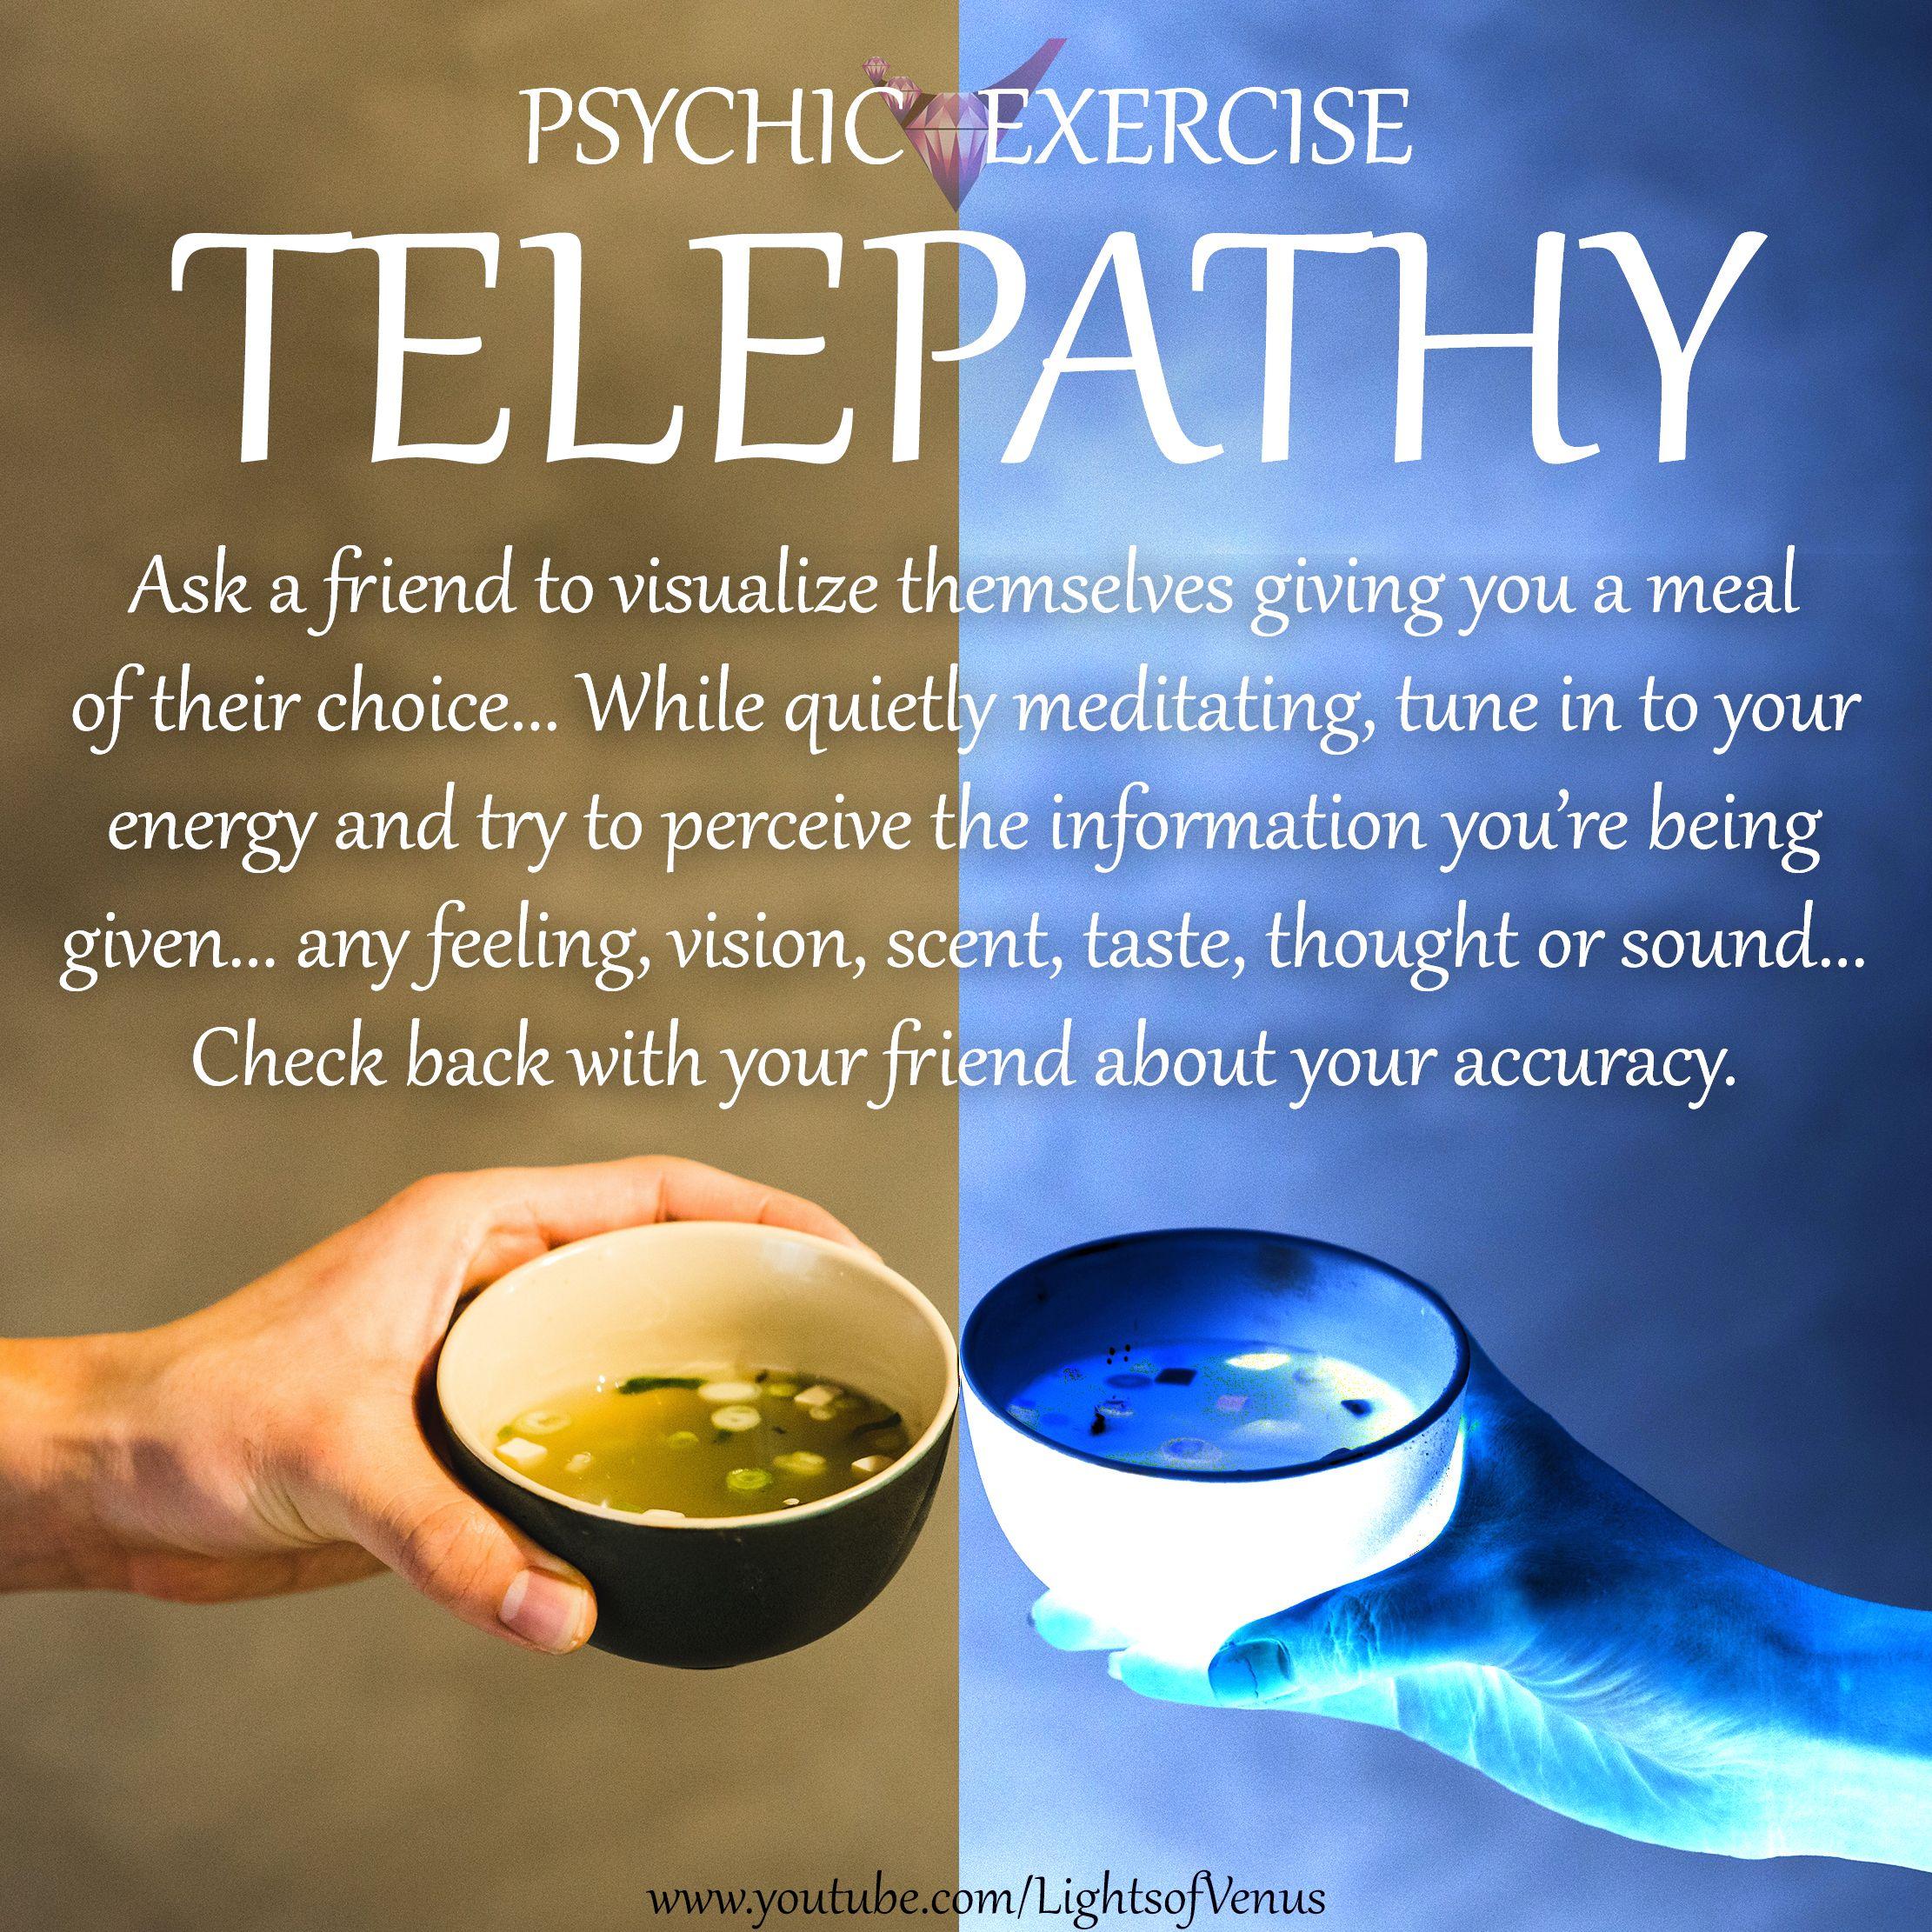 Telepathy test with friend